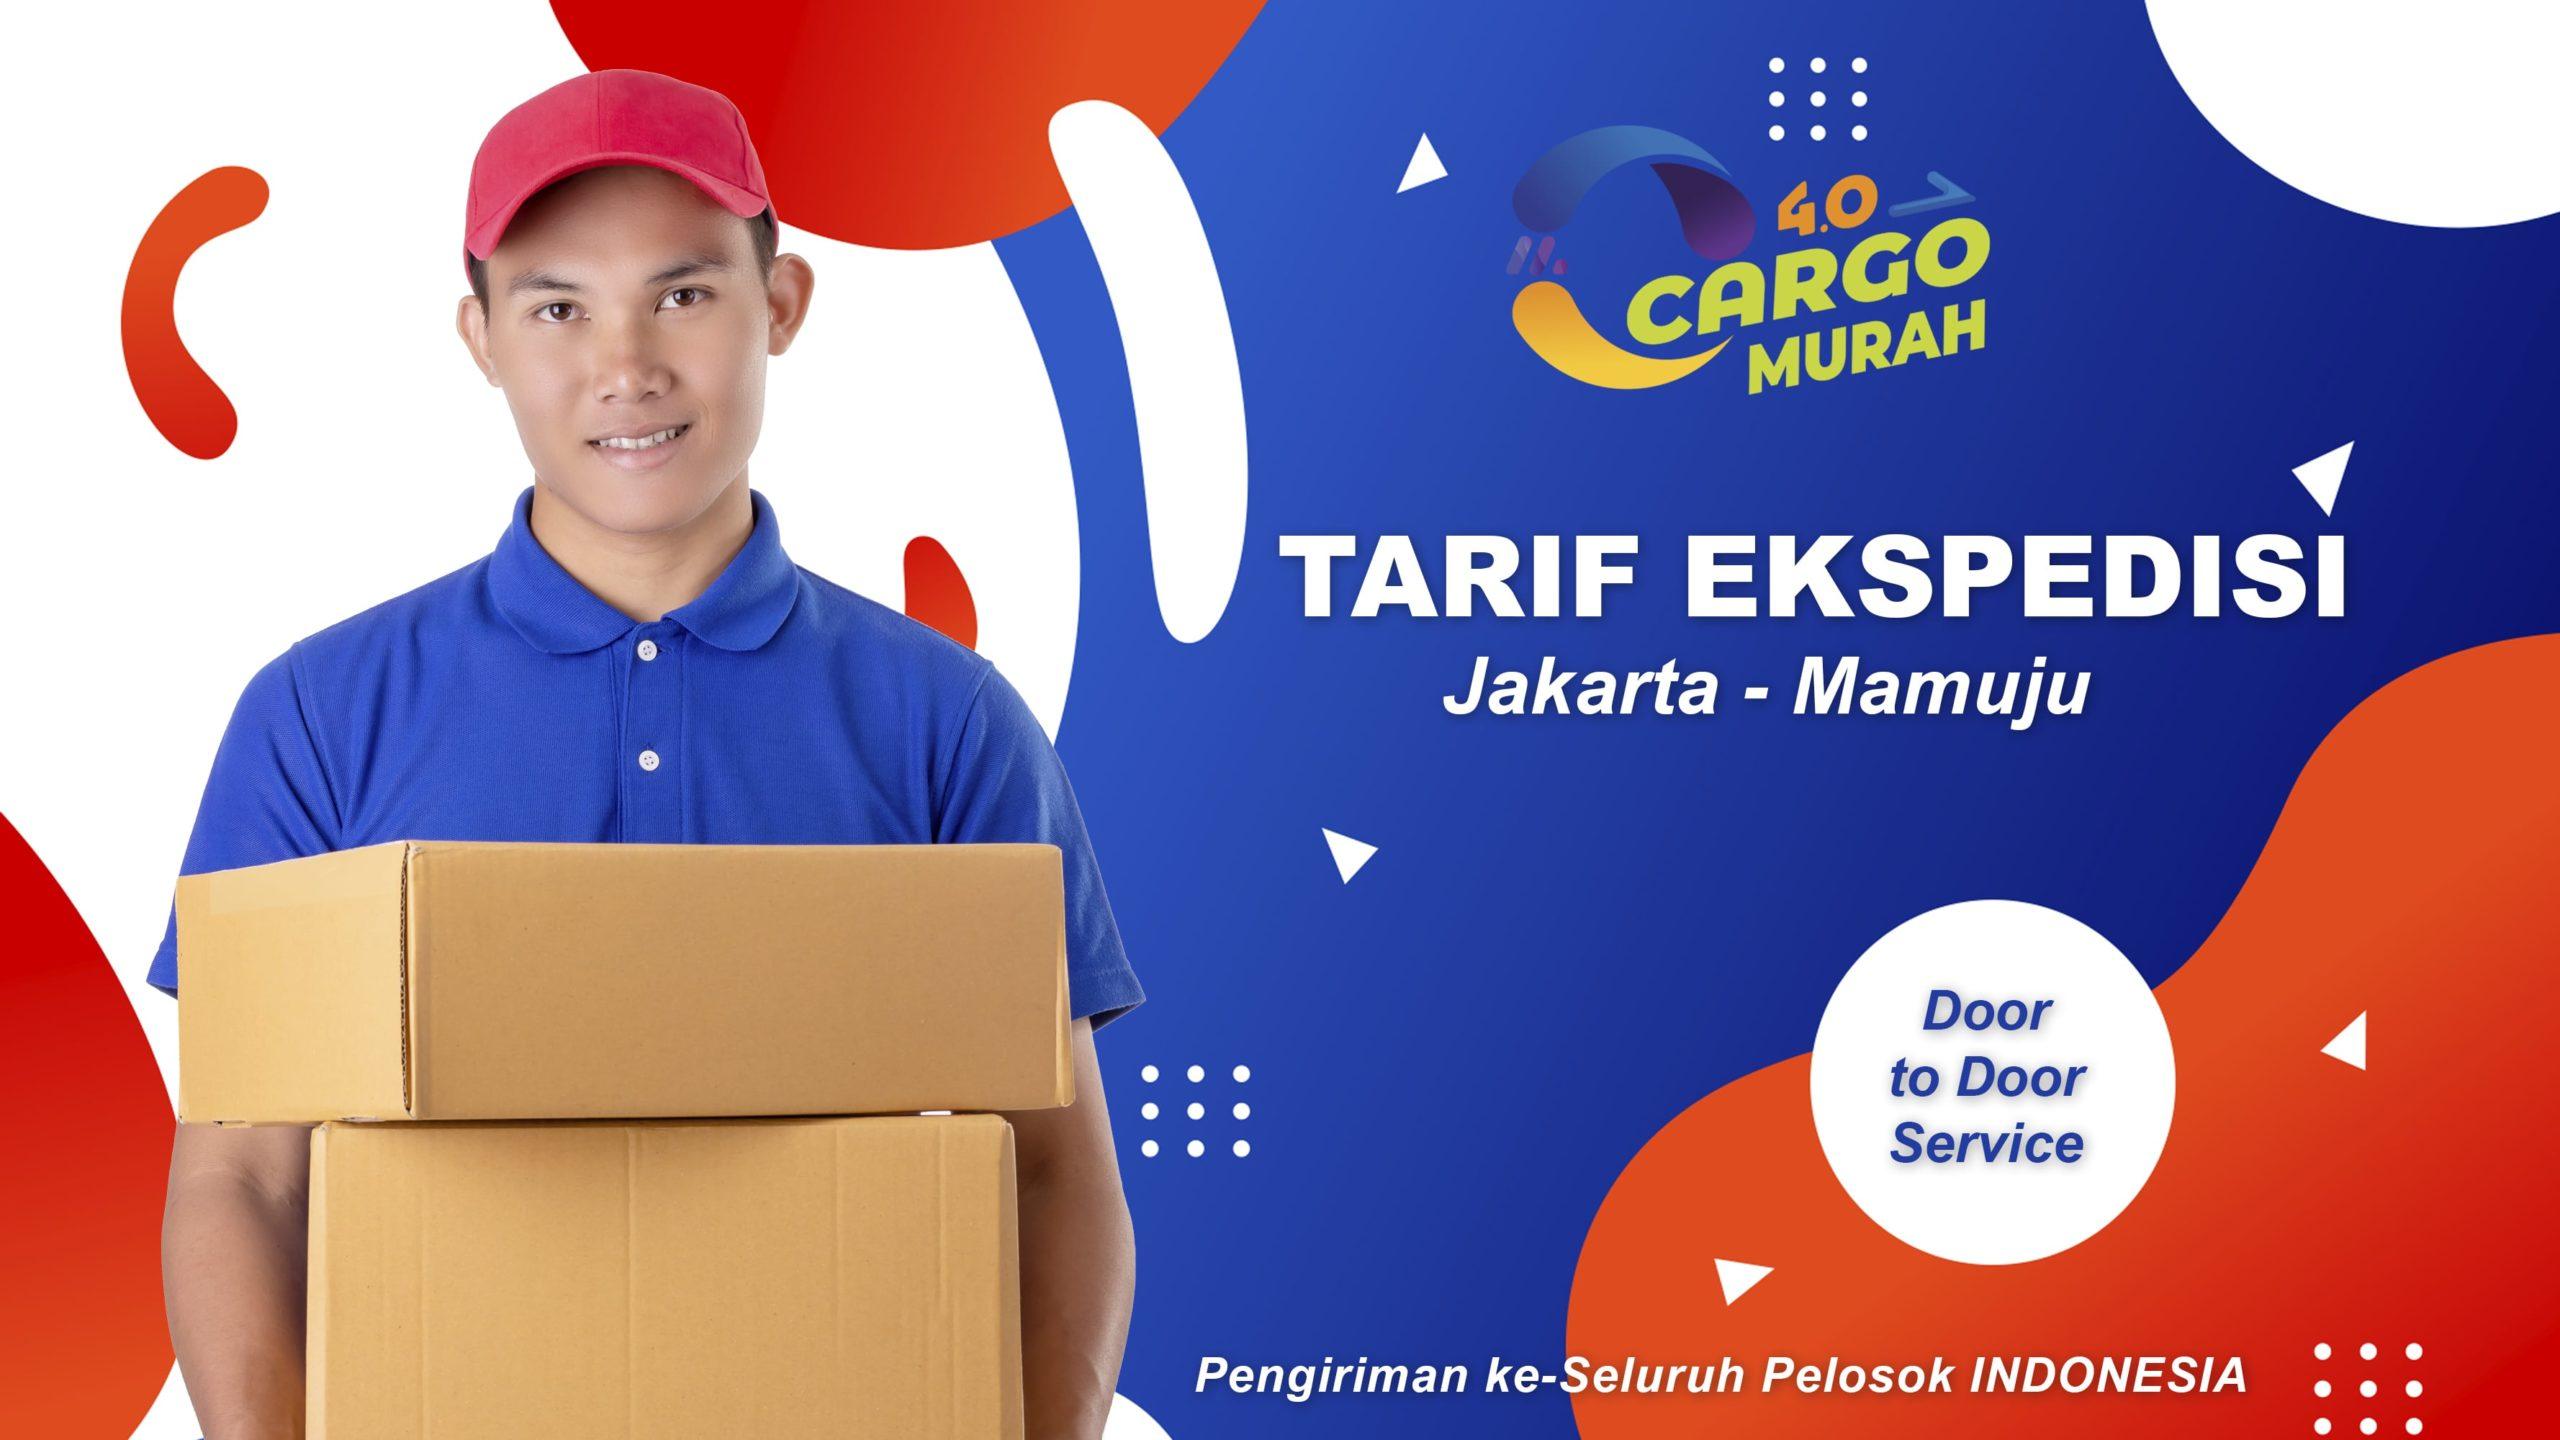 Jasa Pengiriman Barang Jakarta Mamuju